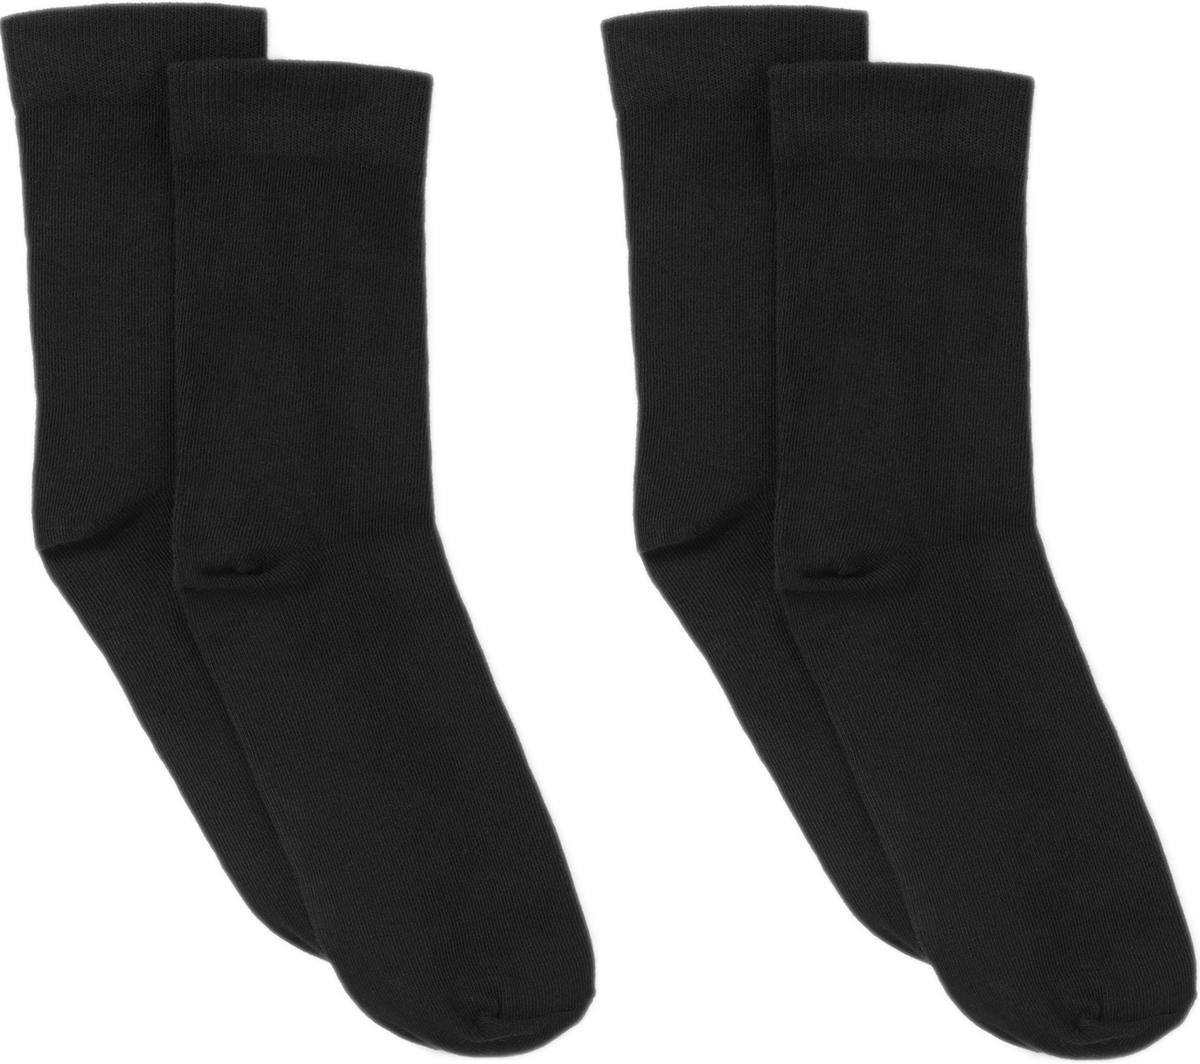 Носки ARTIE, цвет: черный, 2 пары. 2-3a000. Размер 22/24